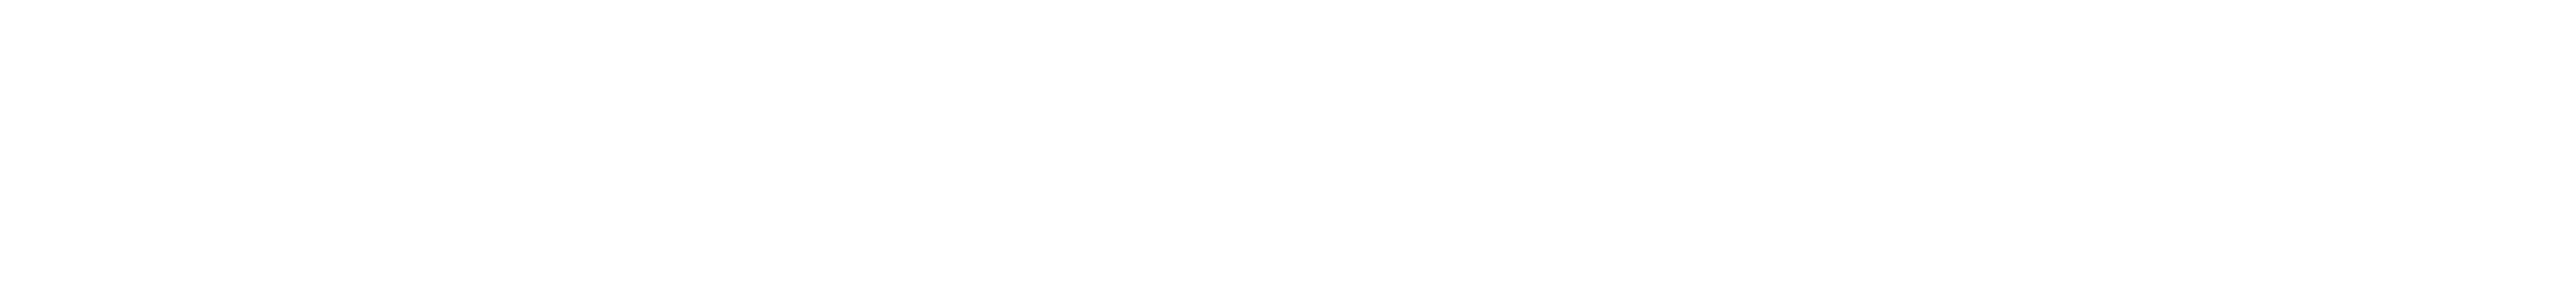 Logotipo Hand Talk seguido do título Community